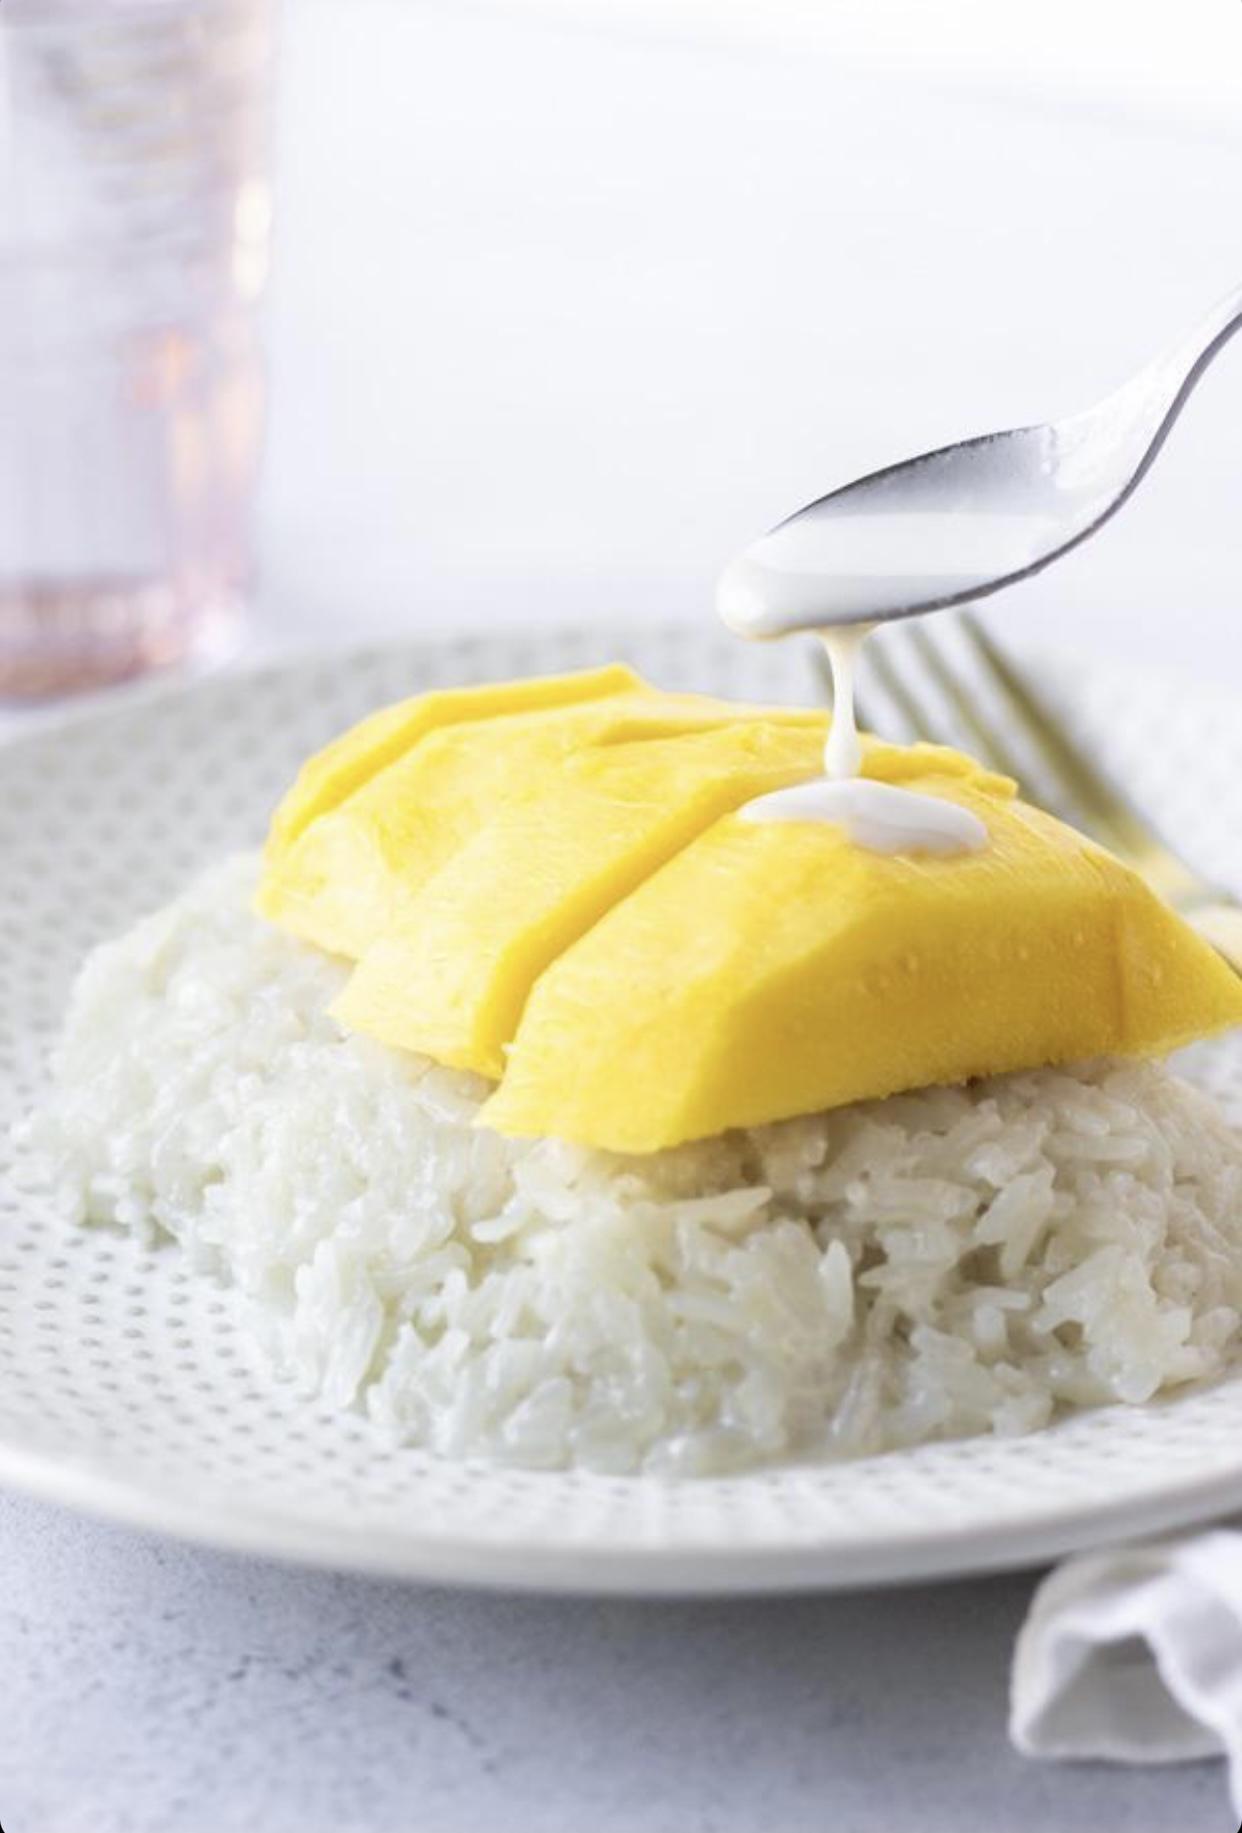 mango recipes of mango on rice with sweet sauce